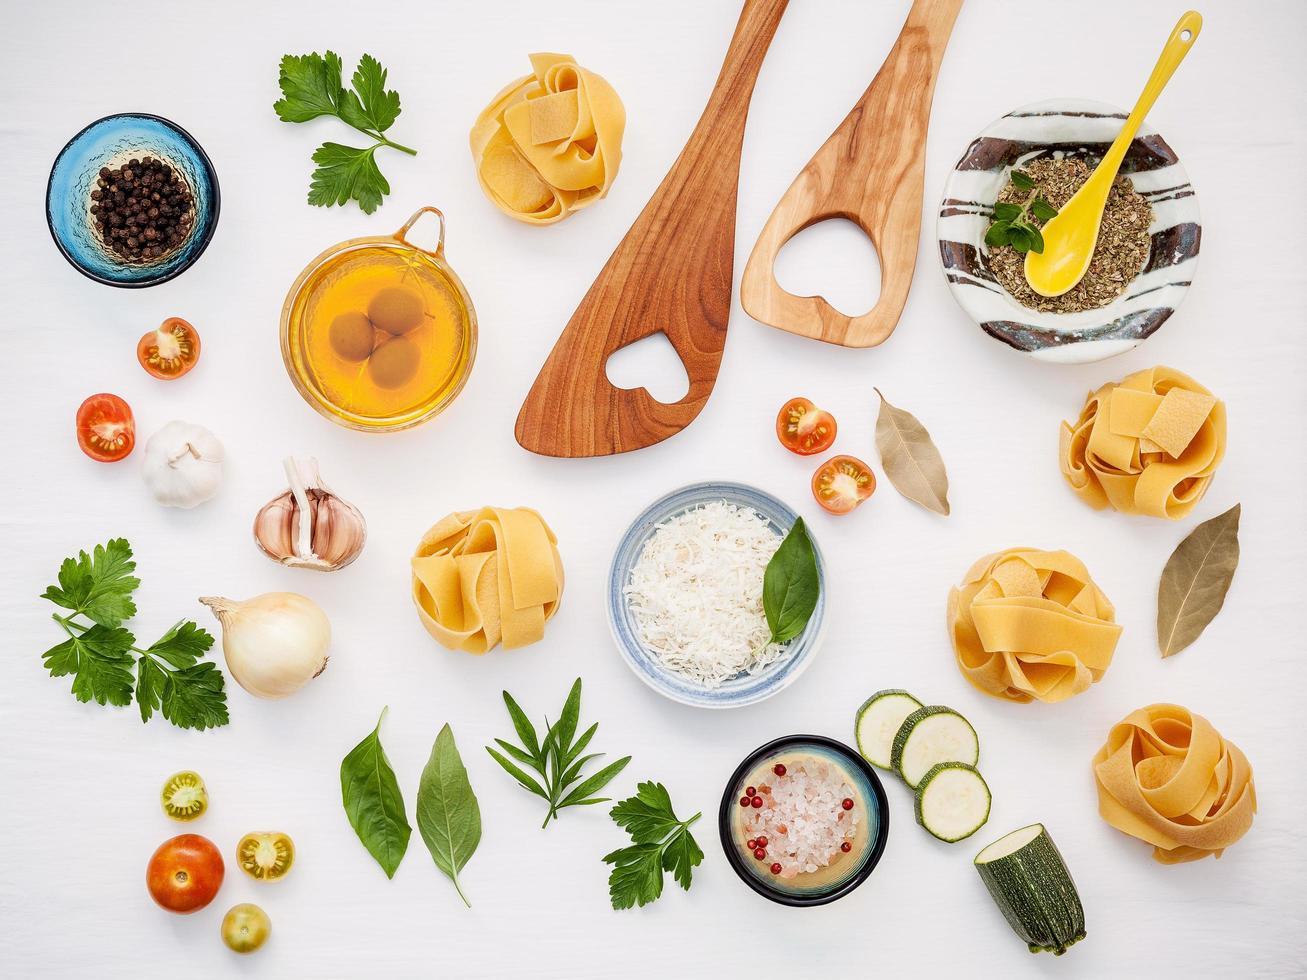 Top view of Italian ingredients photo